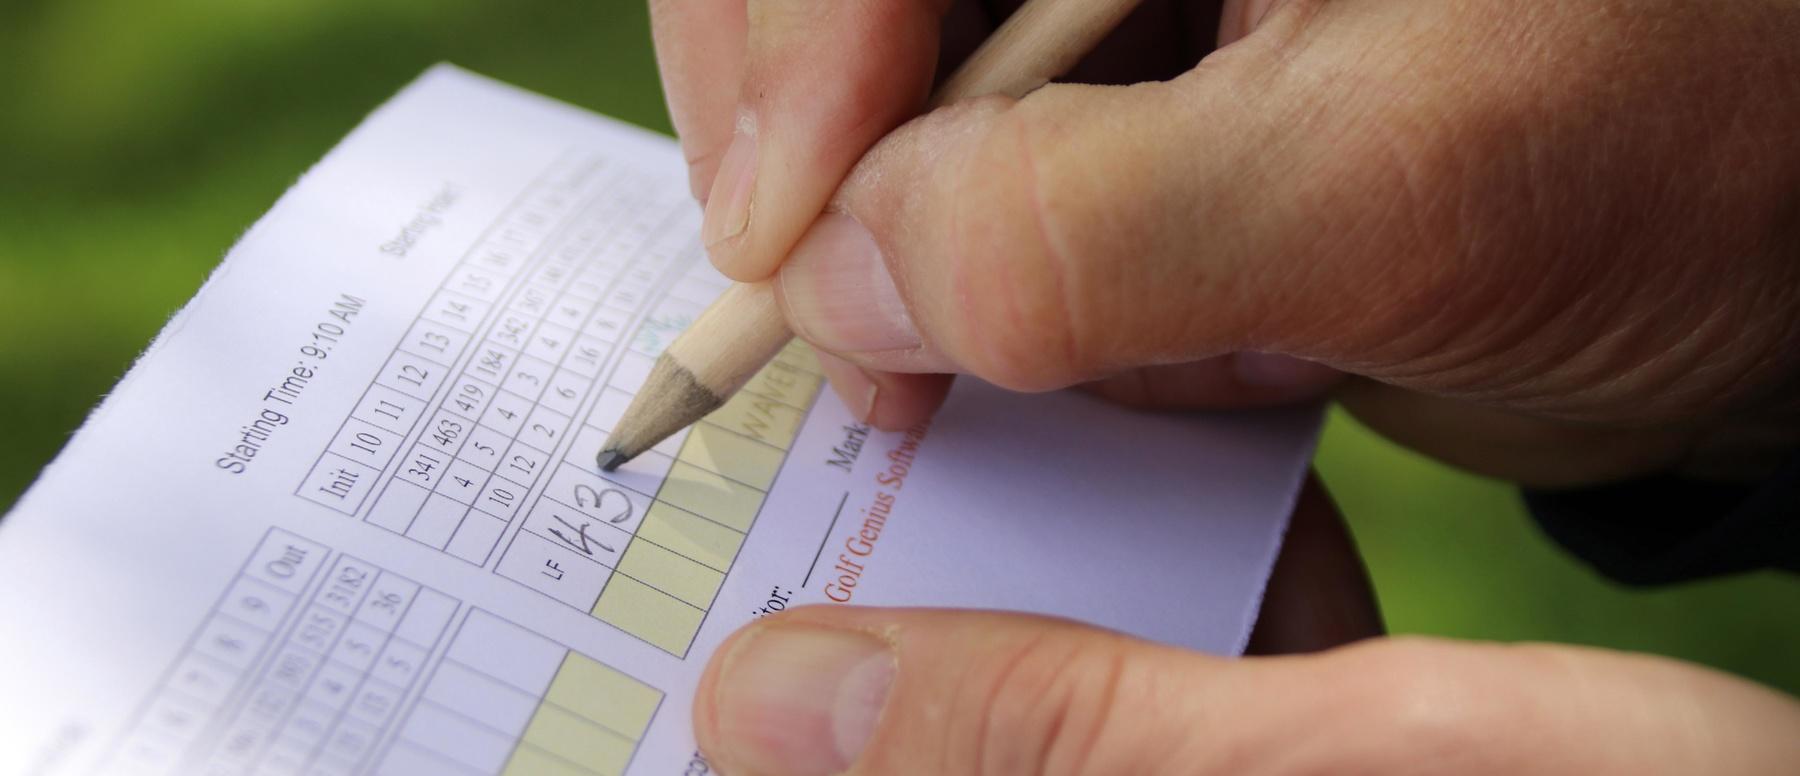 GolfGeniuscrop_scoring